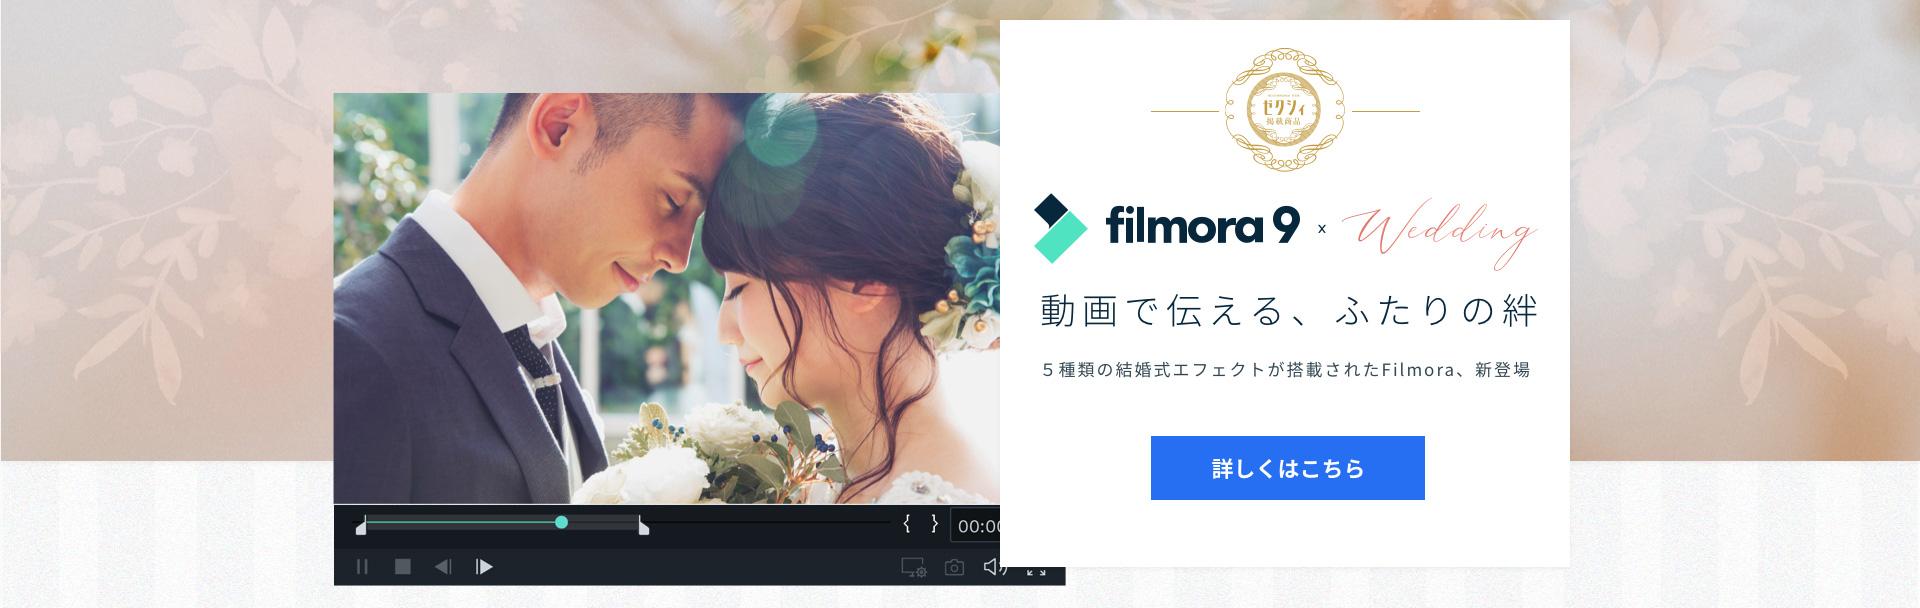 Filmora wedding